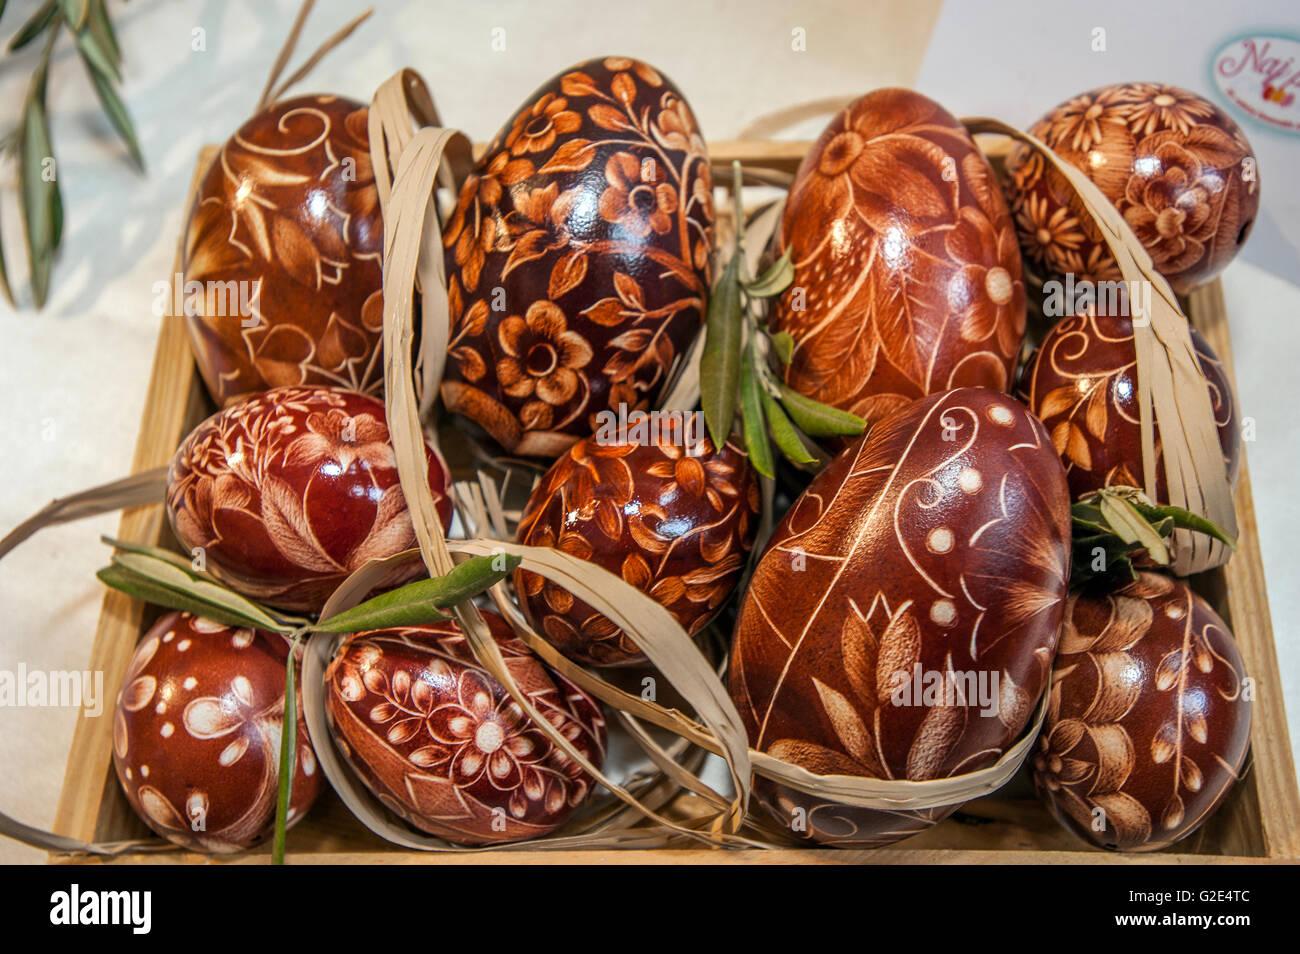 Slovenia LJubljana Exibition of artwork with  Eggs for Easter - Stock Image